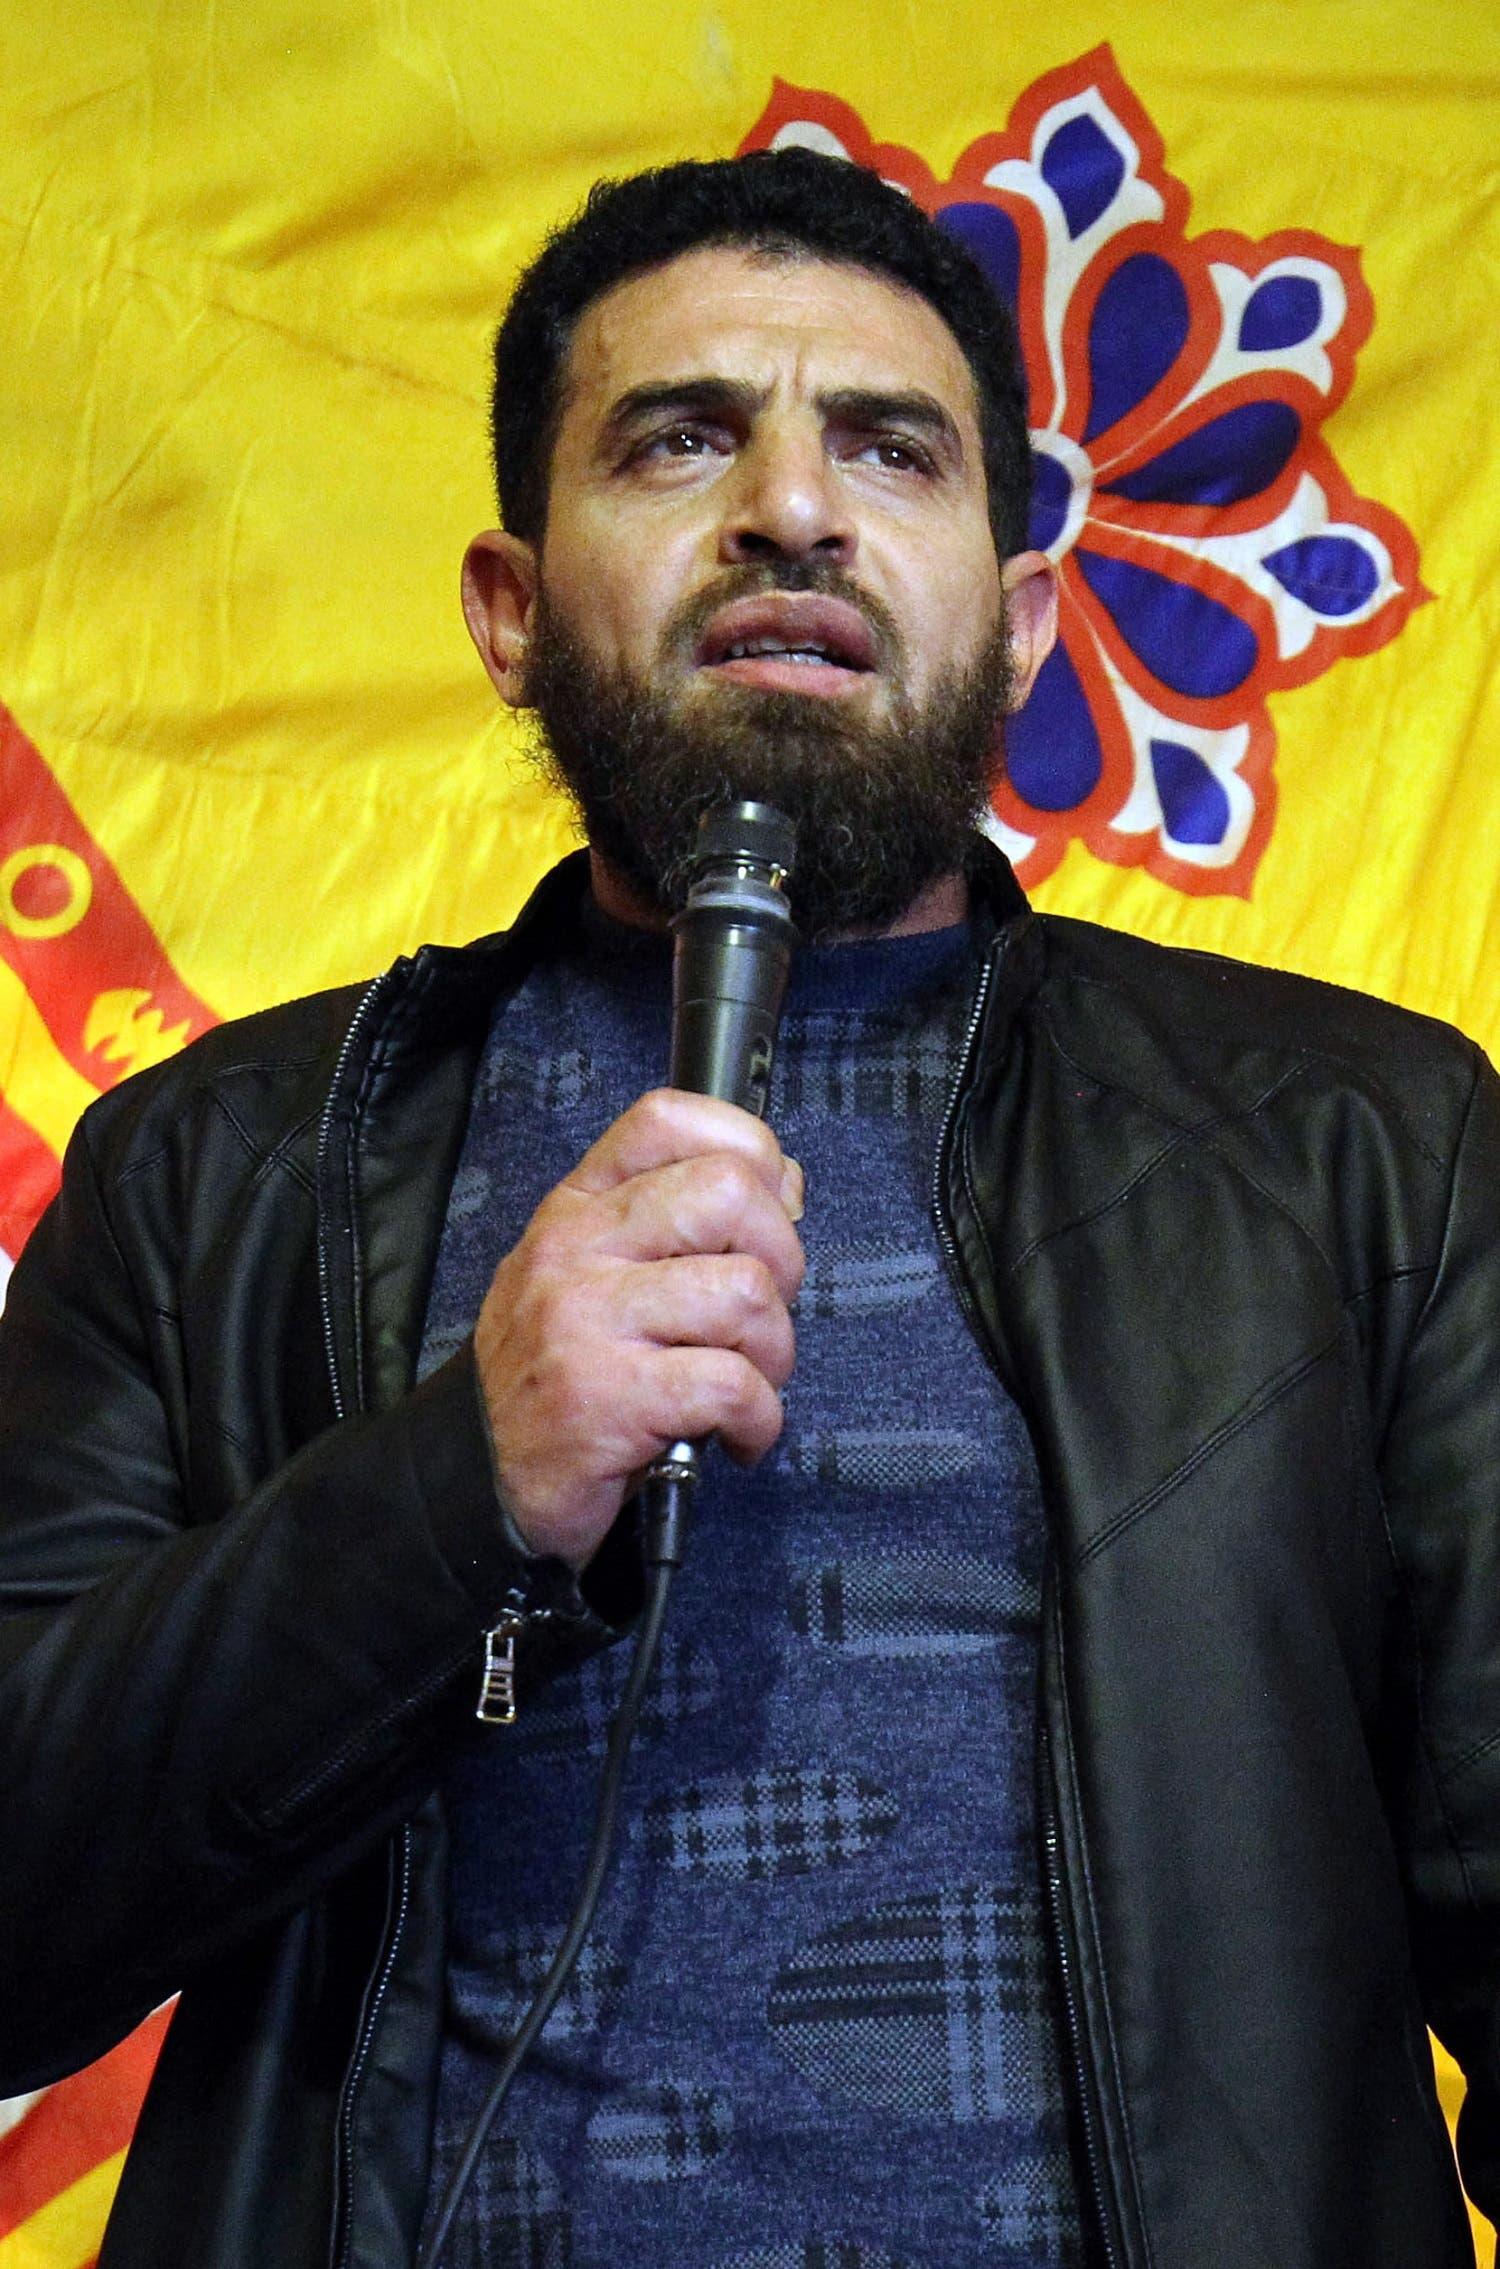 A picture taken on January 26, 2017 shows Mahmoud al-Werfalli speaking in Benghazi. (AFP)